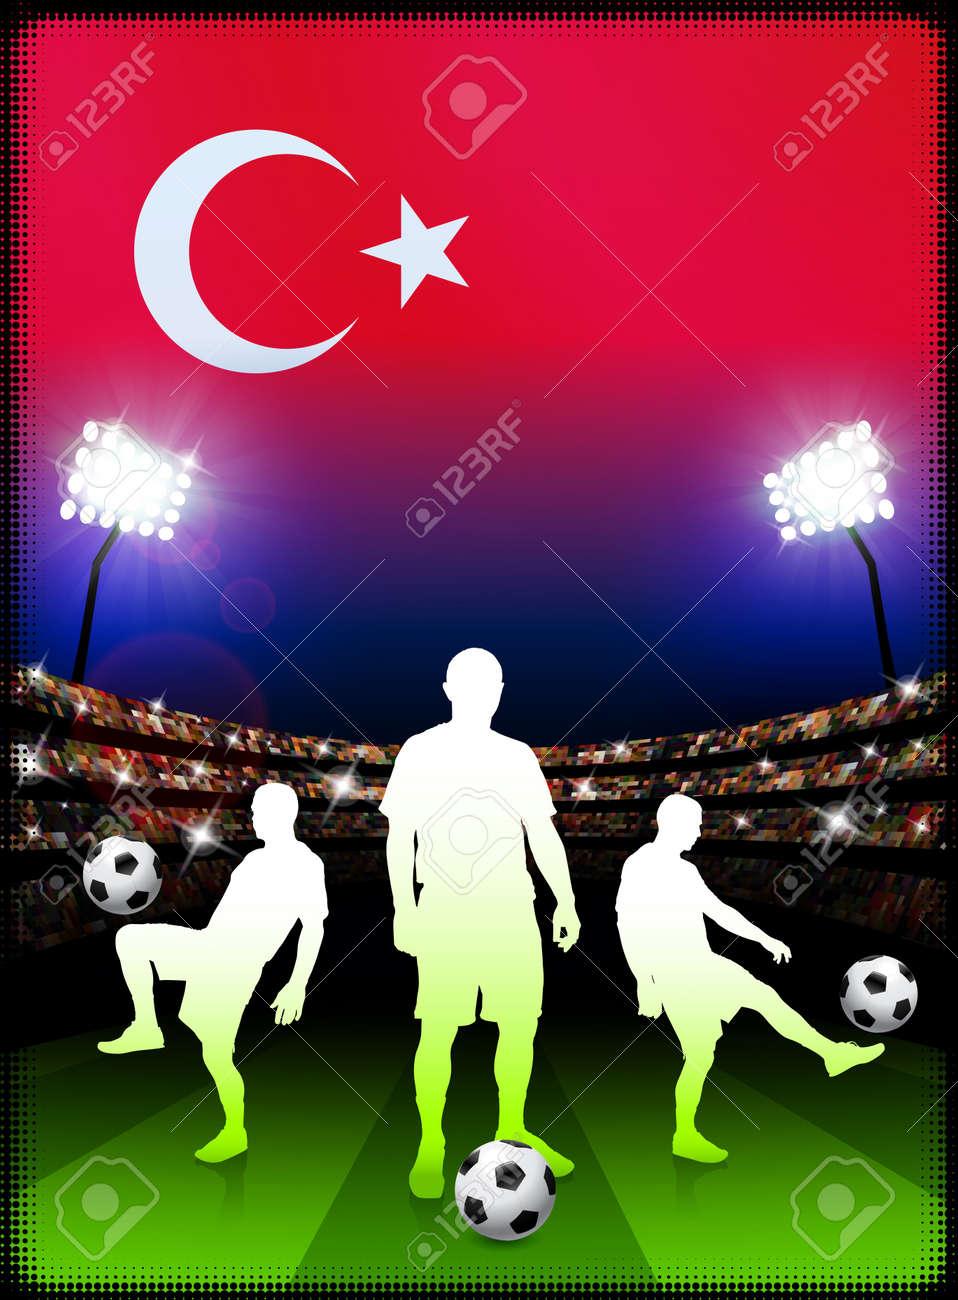 Turkey Soccer Player with Flag on Stadium BackgroundOriginal Illustration Stock Illustration - 7265958